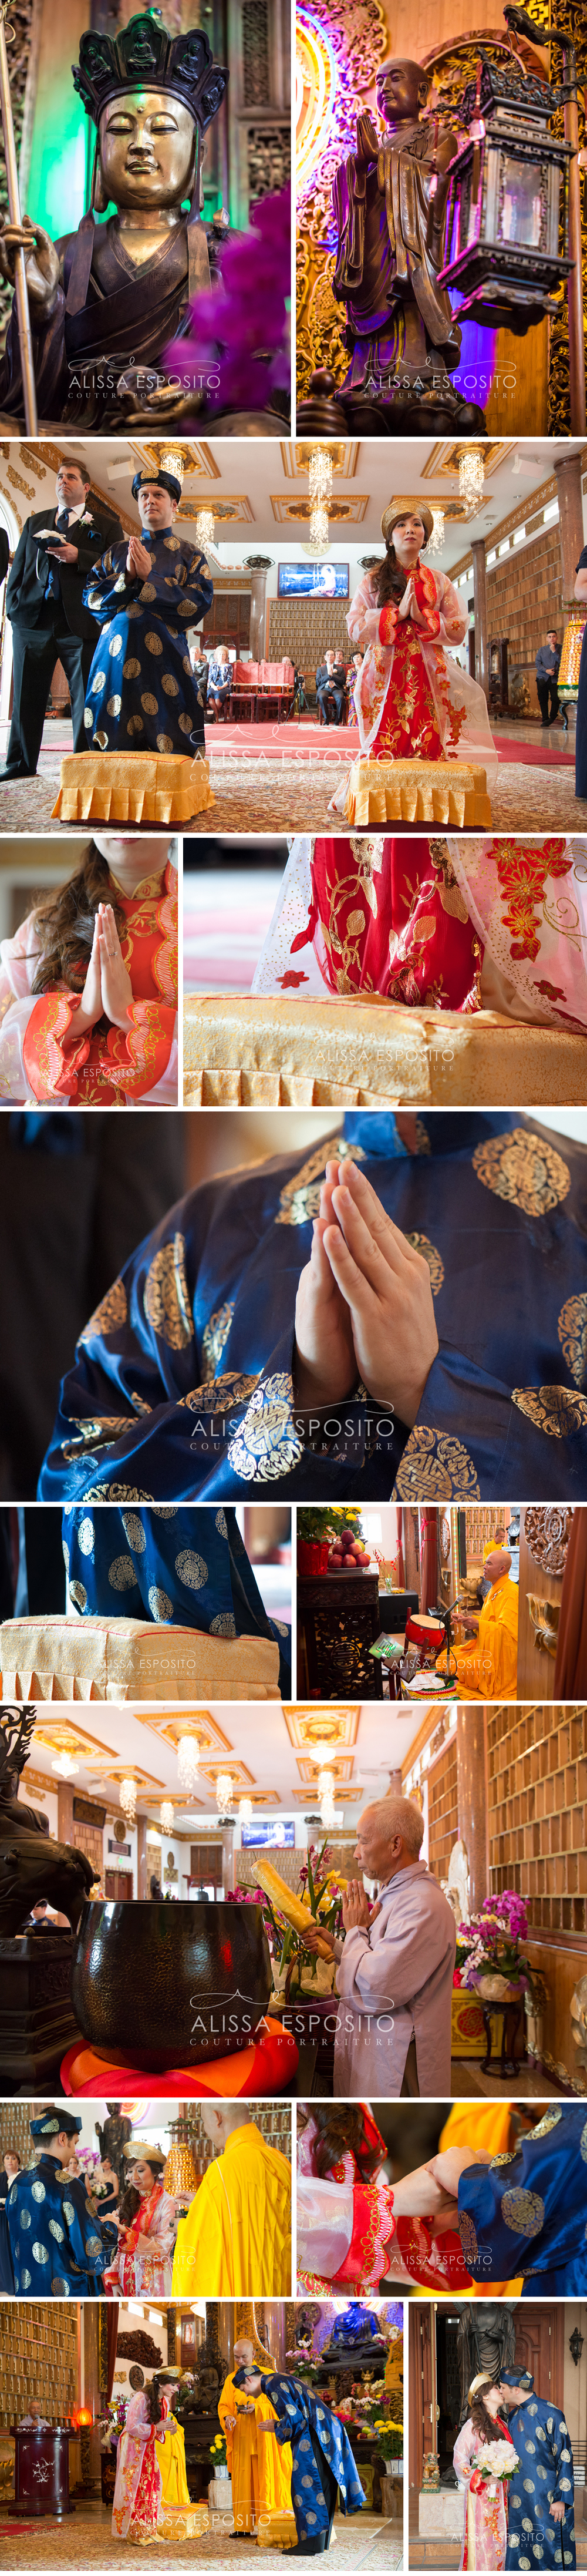 vietnameseTraditional Vietnamese Tea Ceremony Wedding, ao dai, Bhuddhist Temple, Wedding Photography by Alissa Esposito Photograpy www.alissaesposito.comweddingalissaespositoPhotographer.jpg